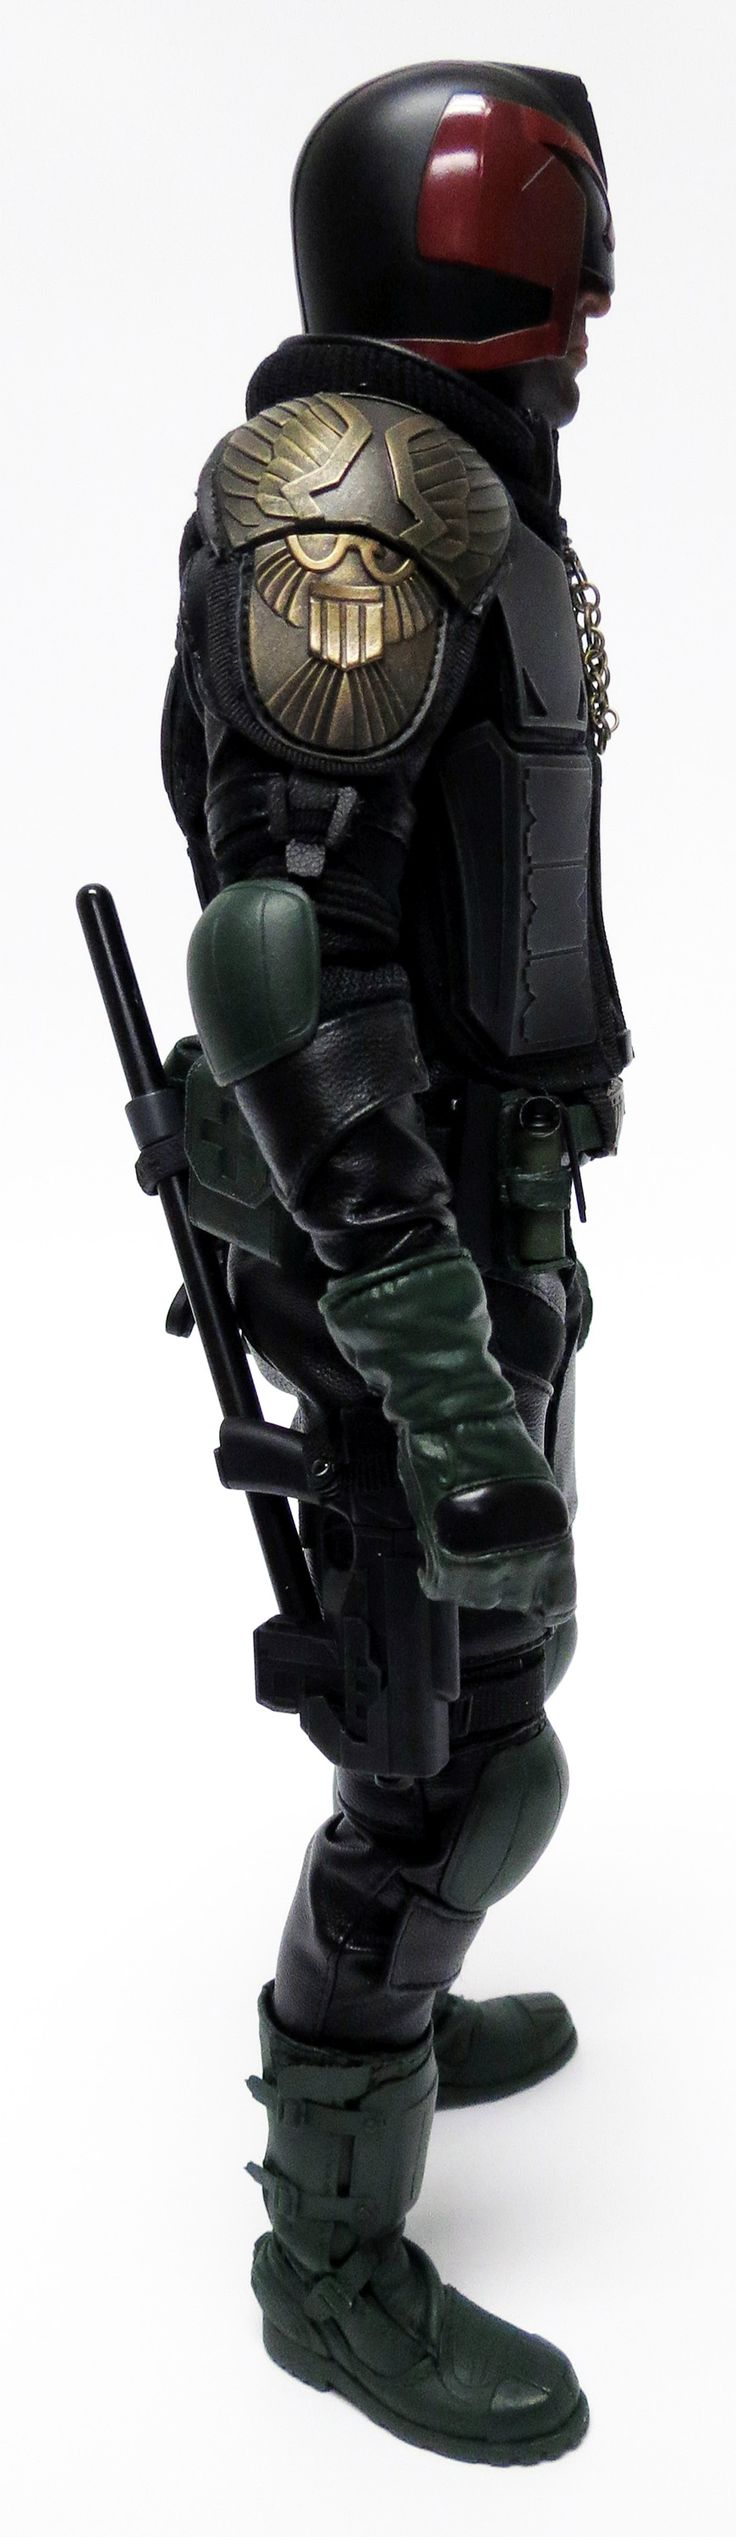 Custom Judge Dredd Art Figures 1/6 figure - custom and photo by Dye Customs